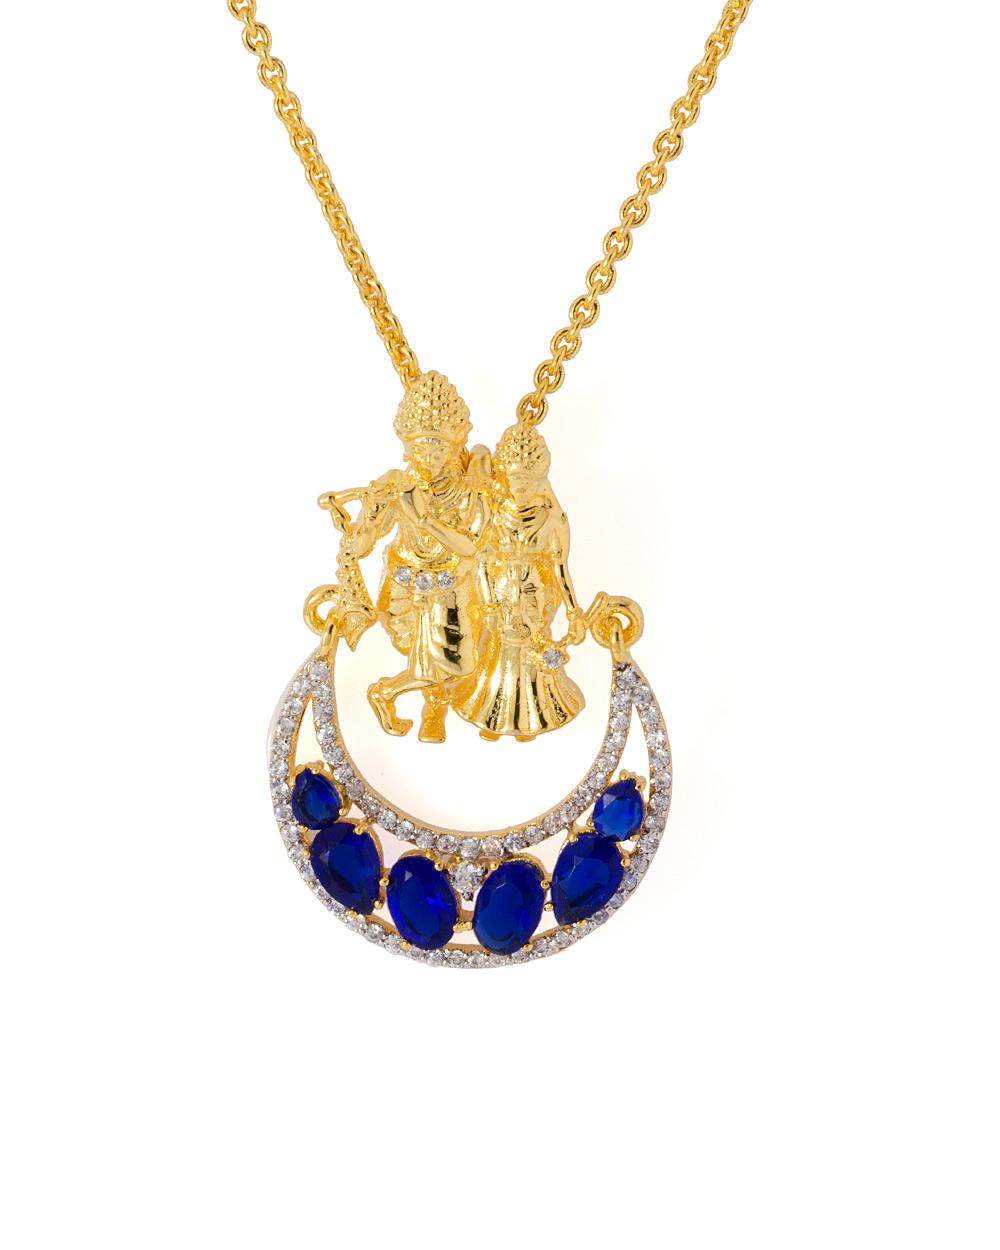 Buy blue white cz embellished radha krishna pendant with chain blue white cz embellished radha krishna pendant with chain aloadofball Gallery